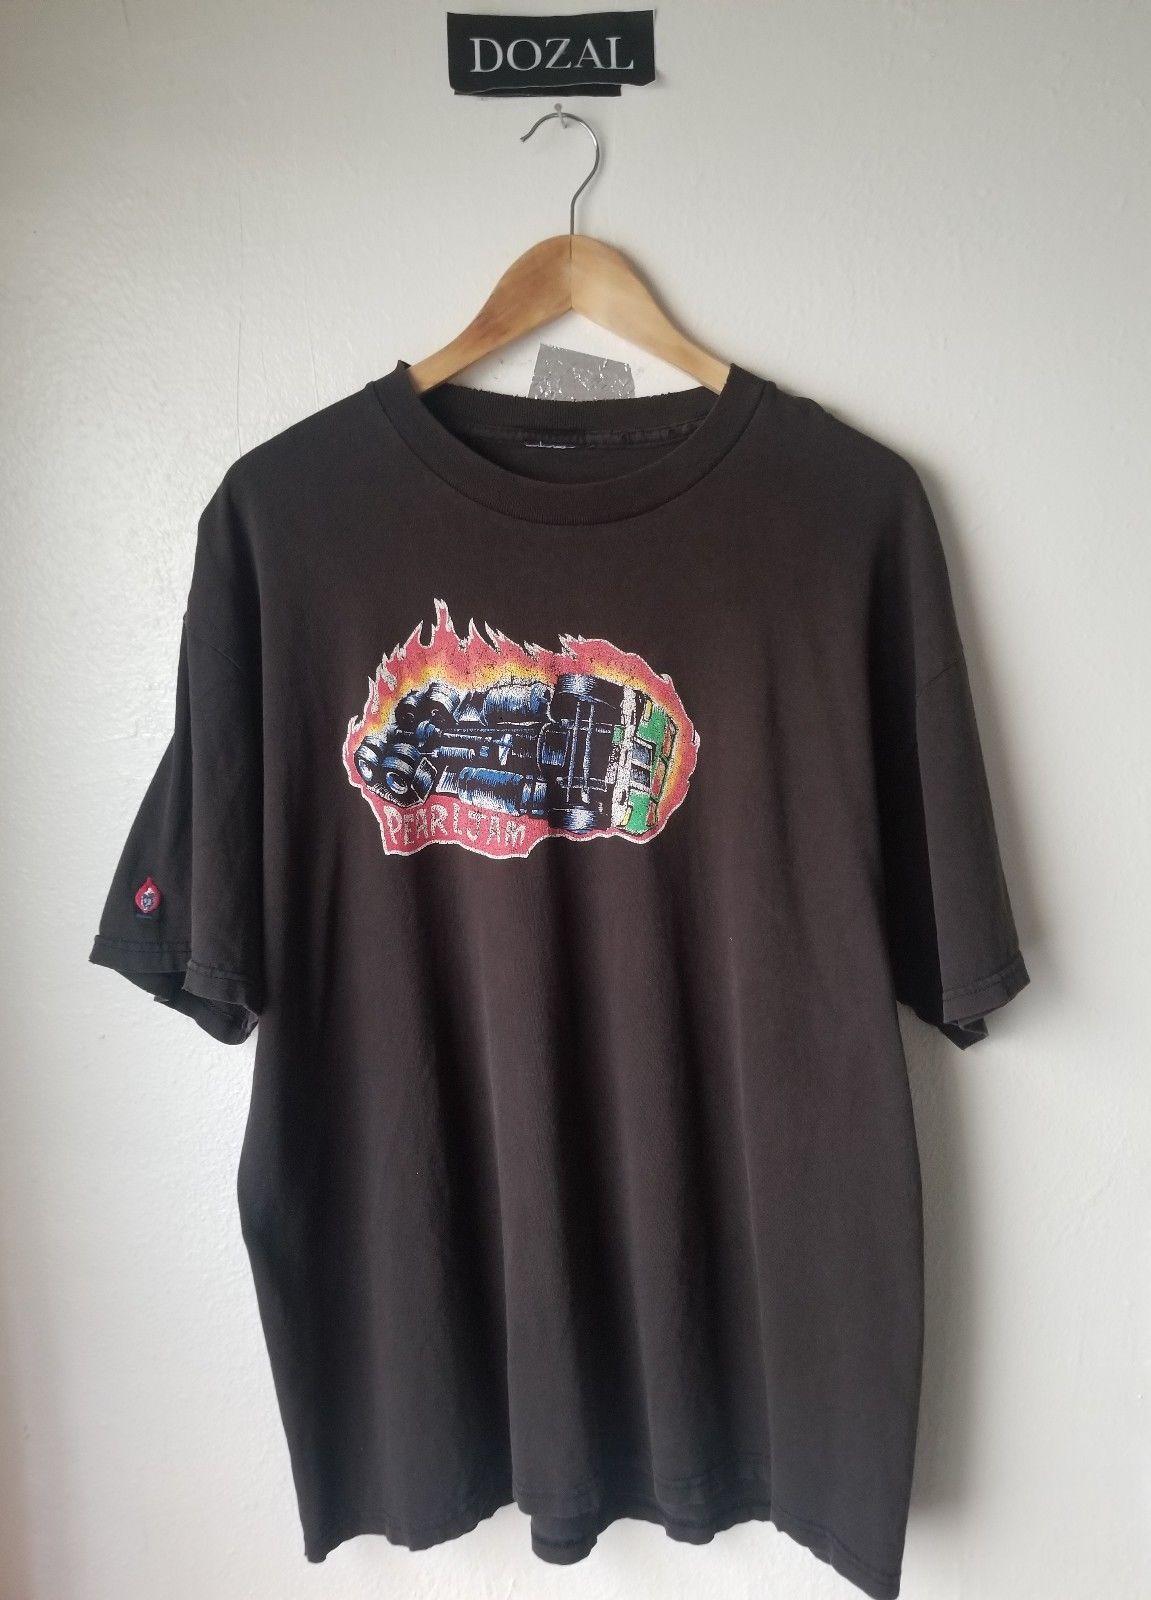 Vintage 90s Pearl Jam Nightmare Tshirt Burning Truck Niceman Size Xl